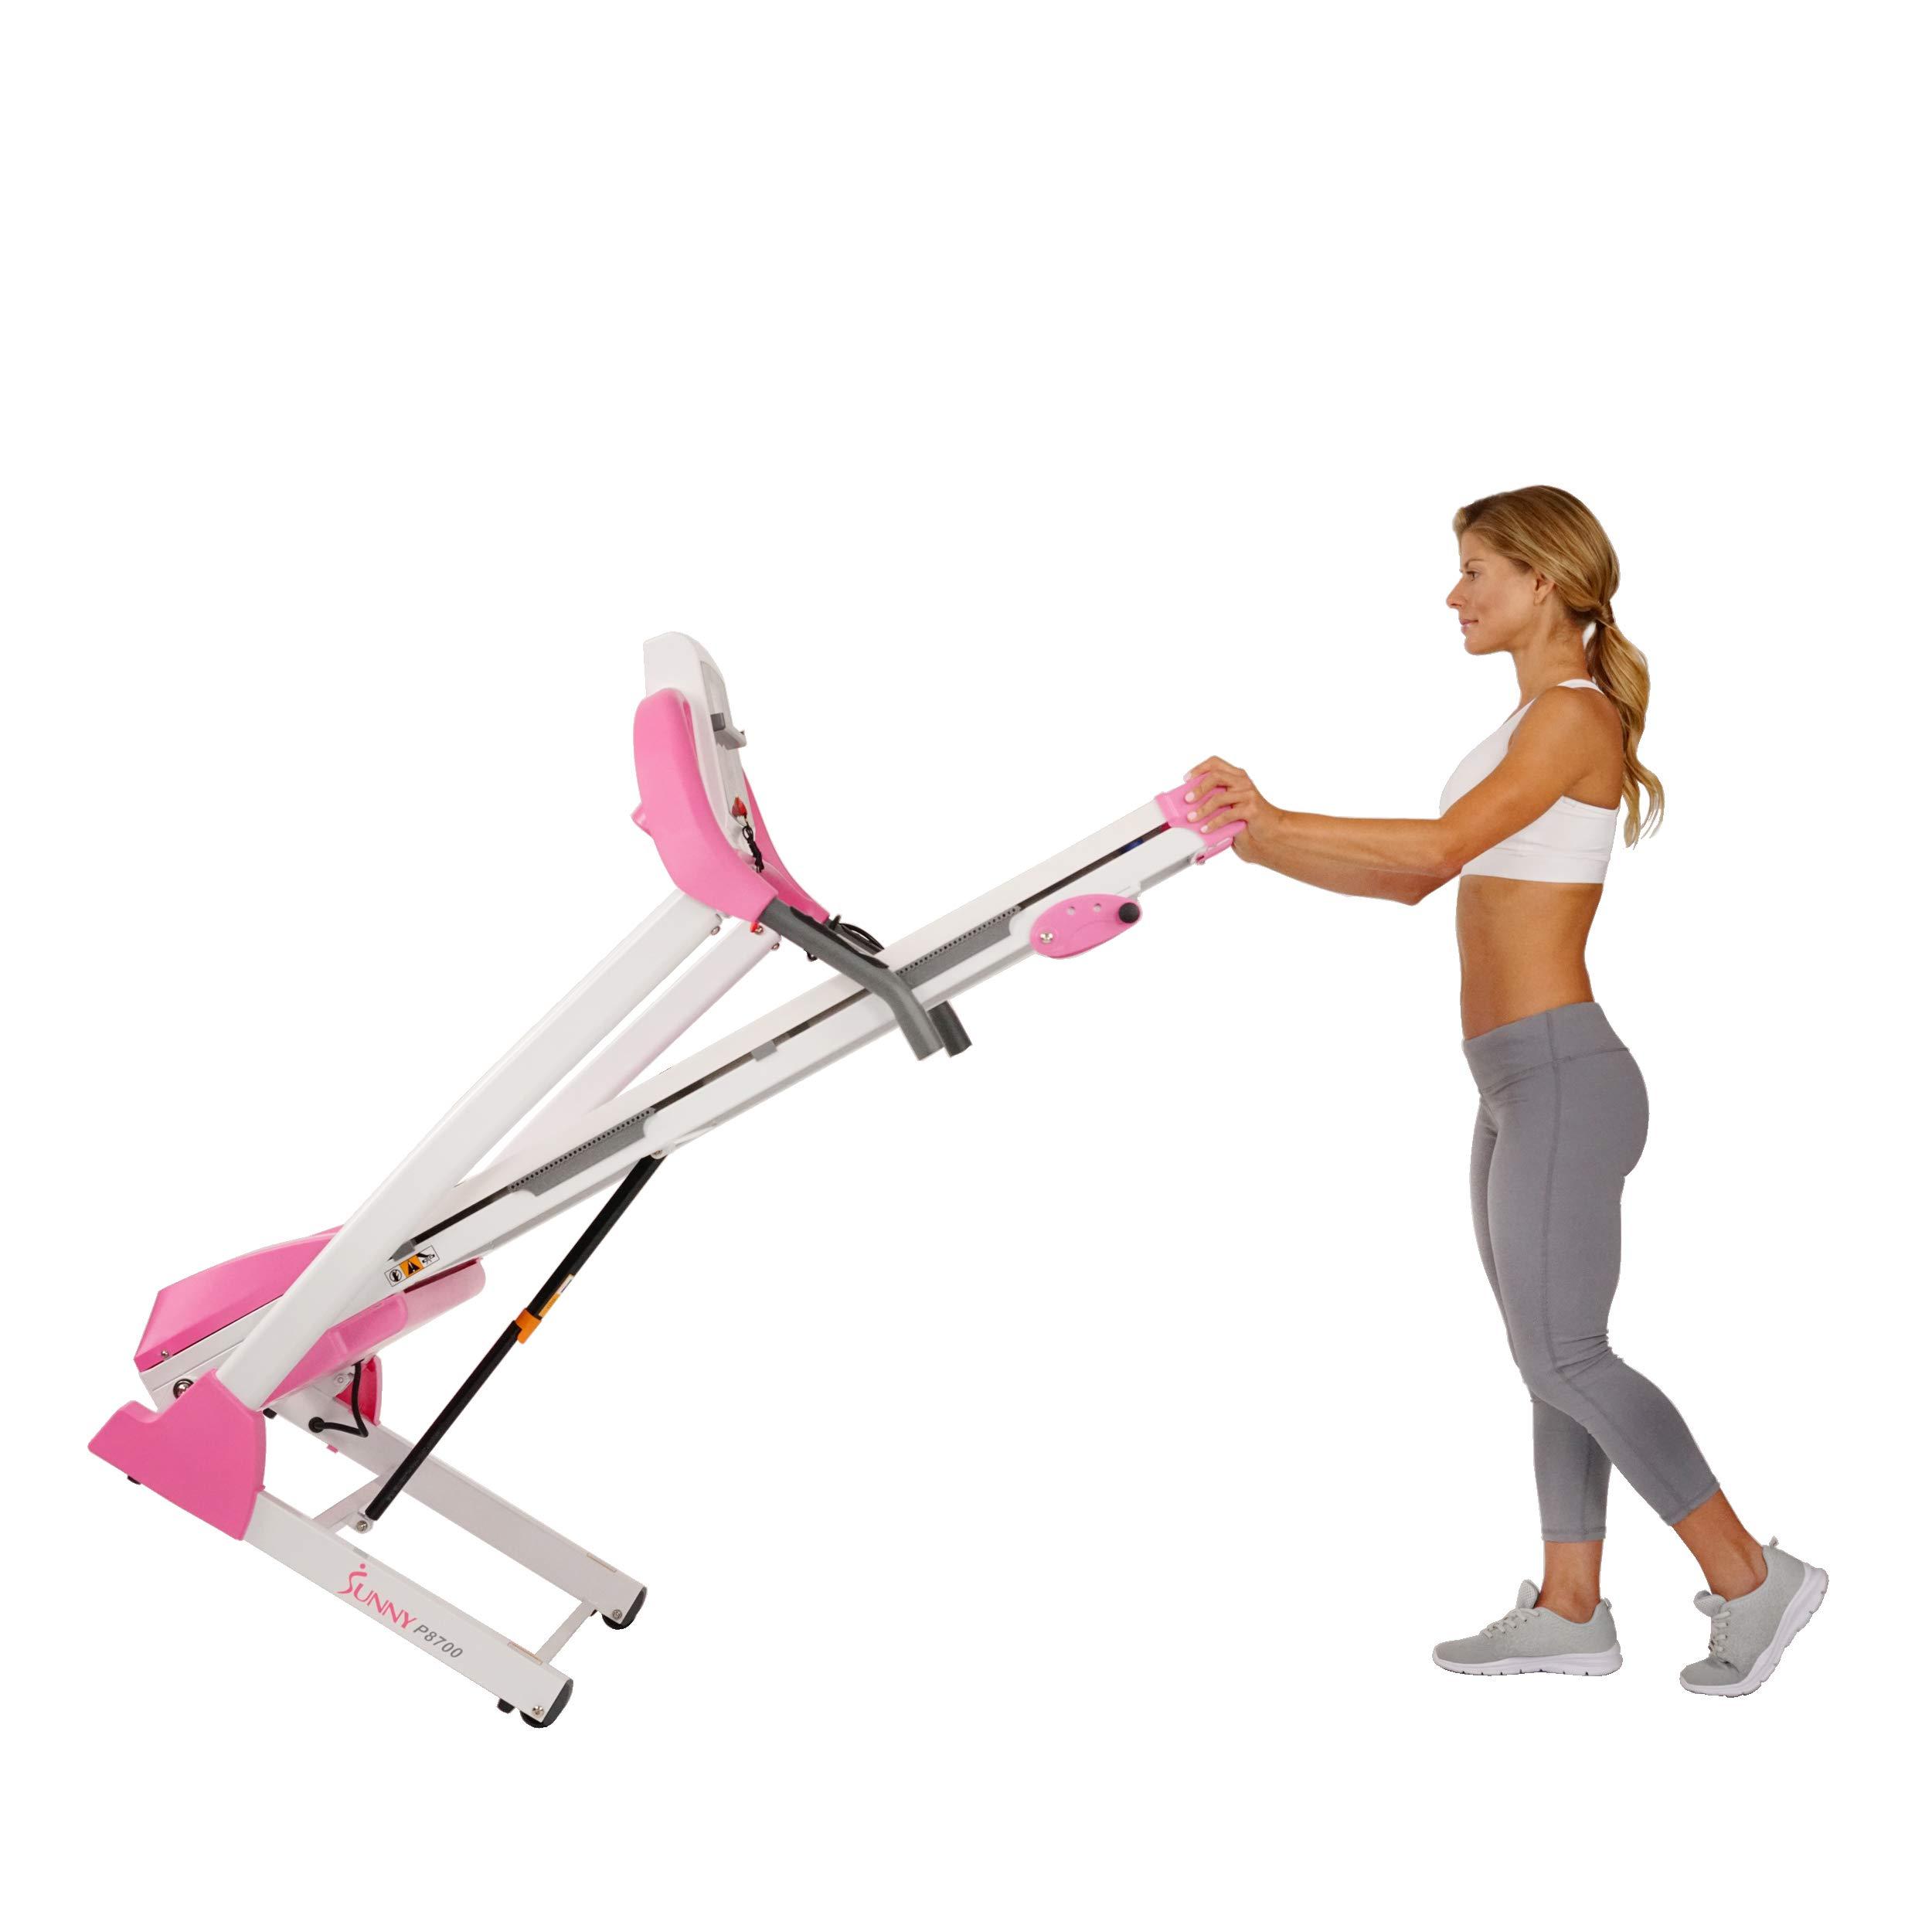 Sunny Health & Fitness P8700 Pink Treadmill by Sunny Health & Fitness (Image #11)